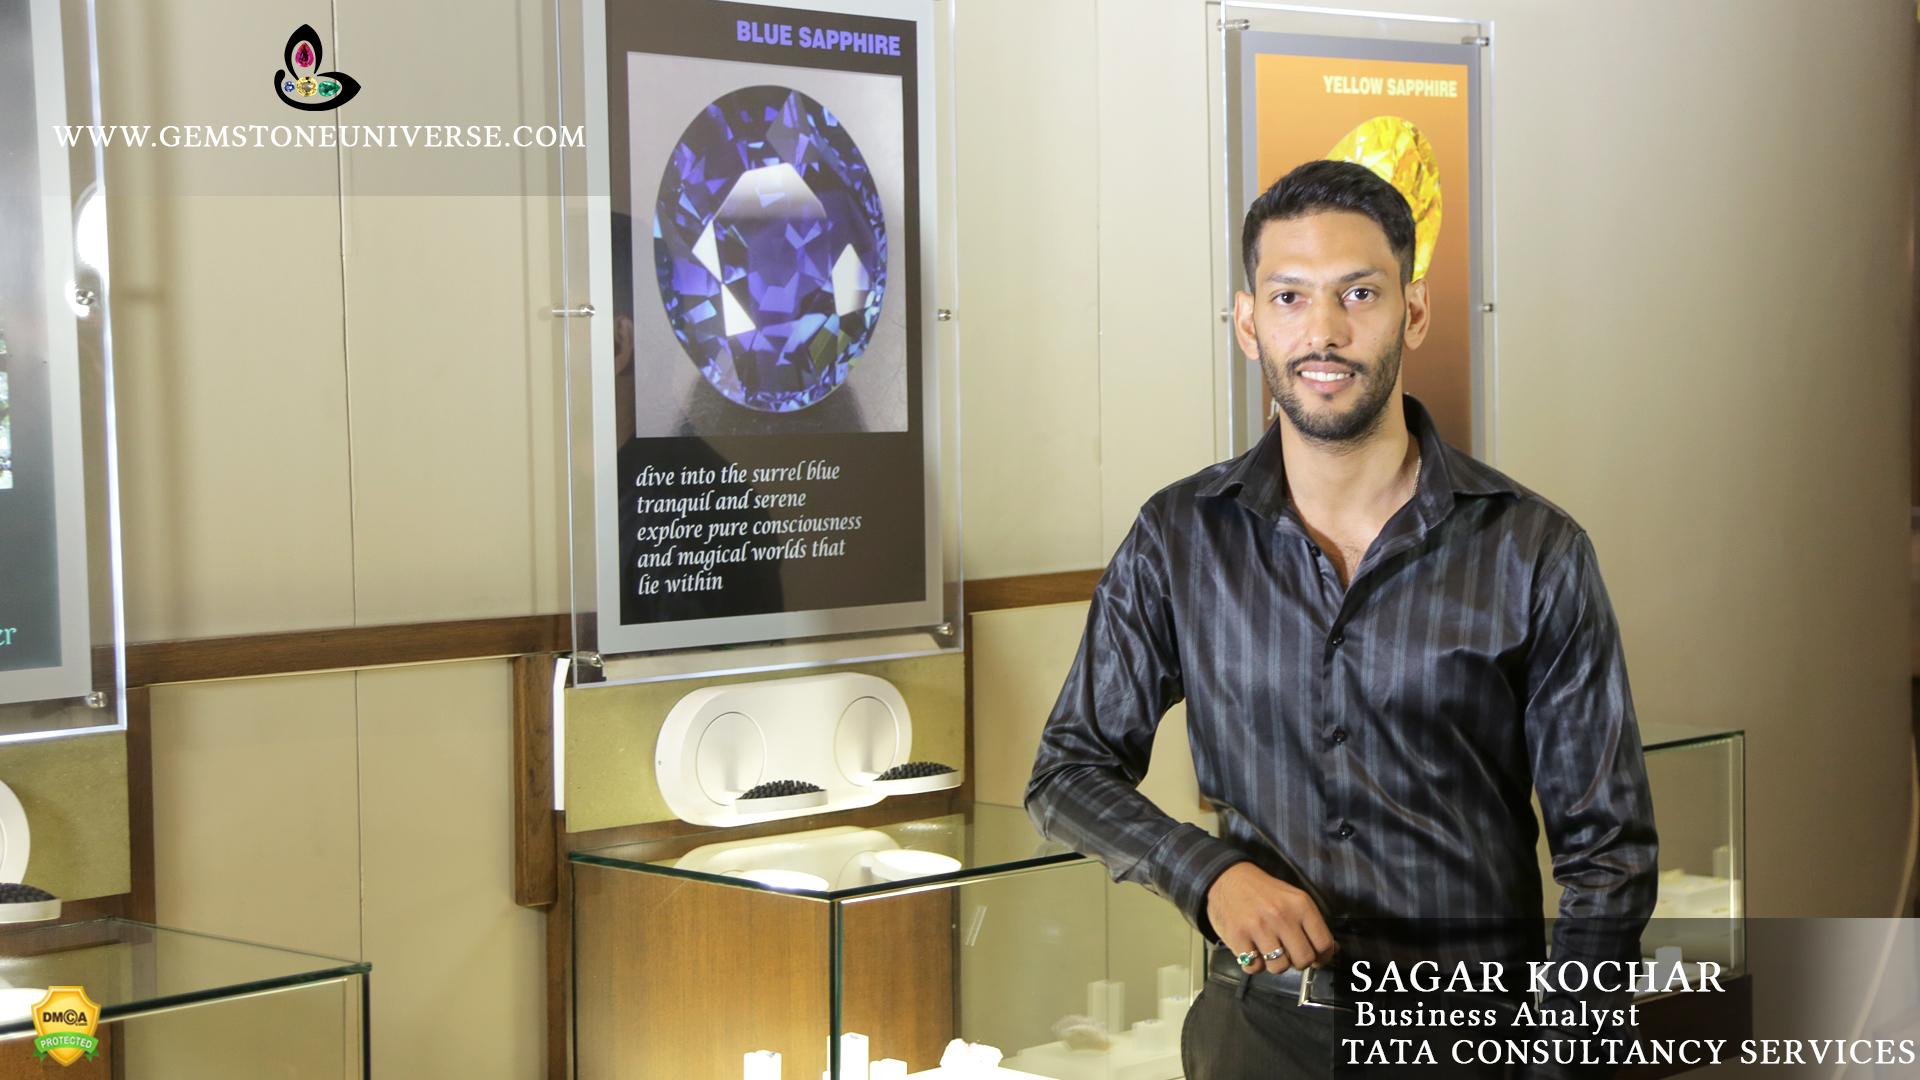 Sagar Kochar Shares his experiencing with Gemstones